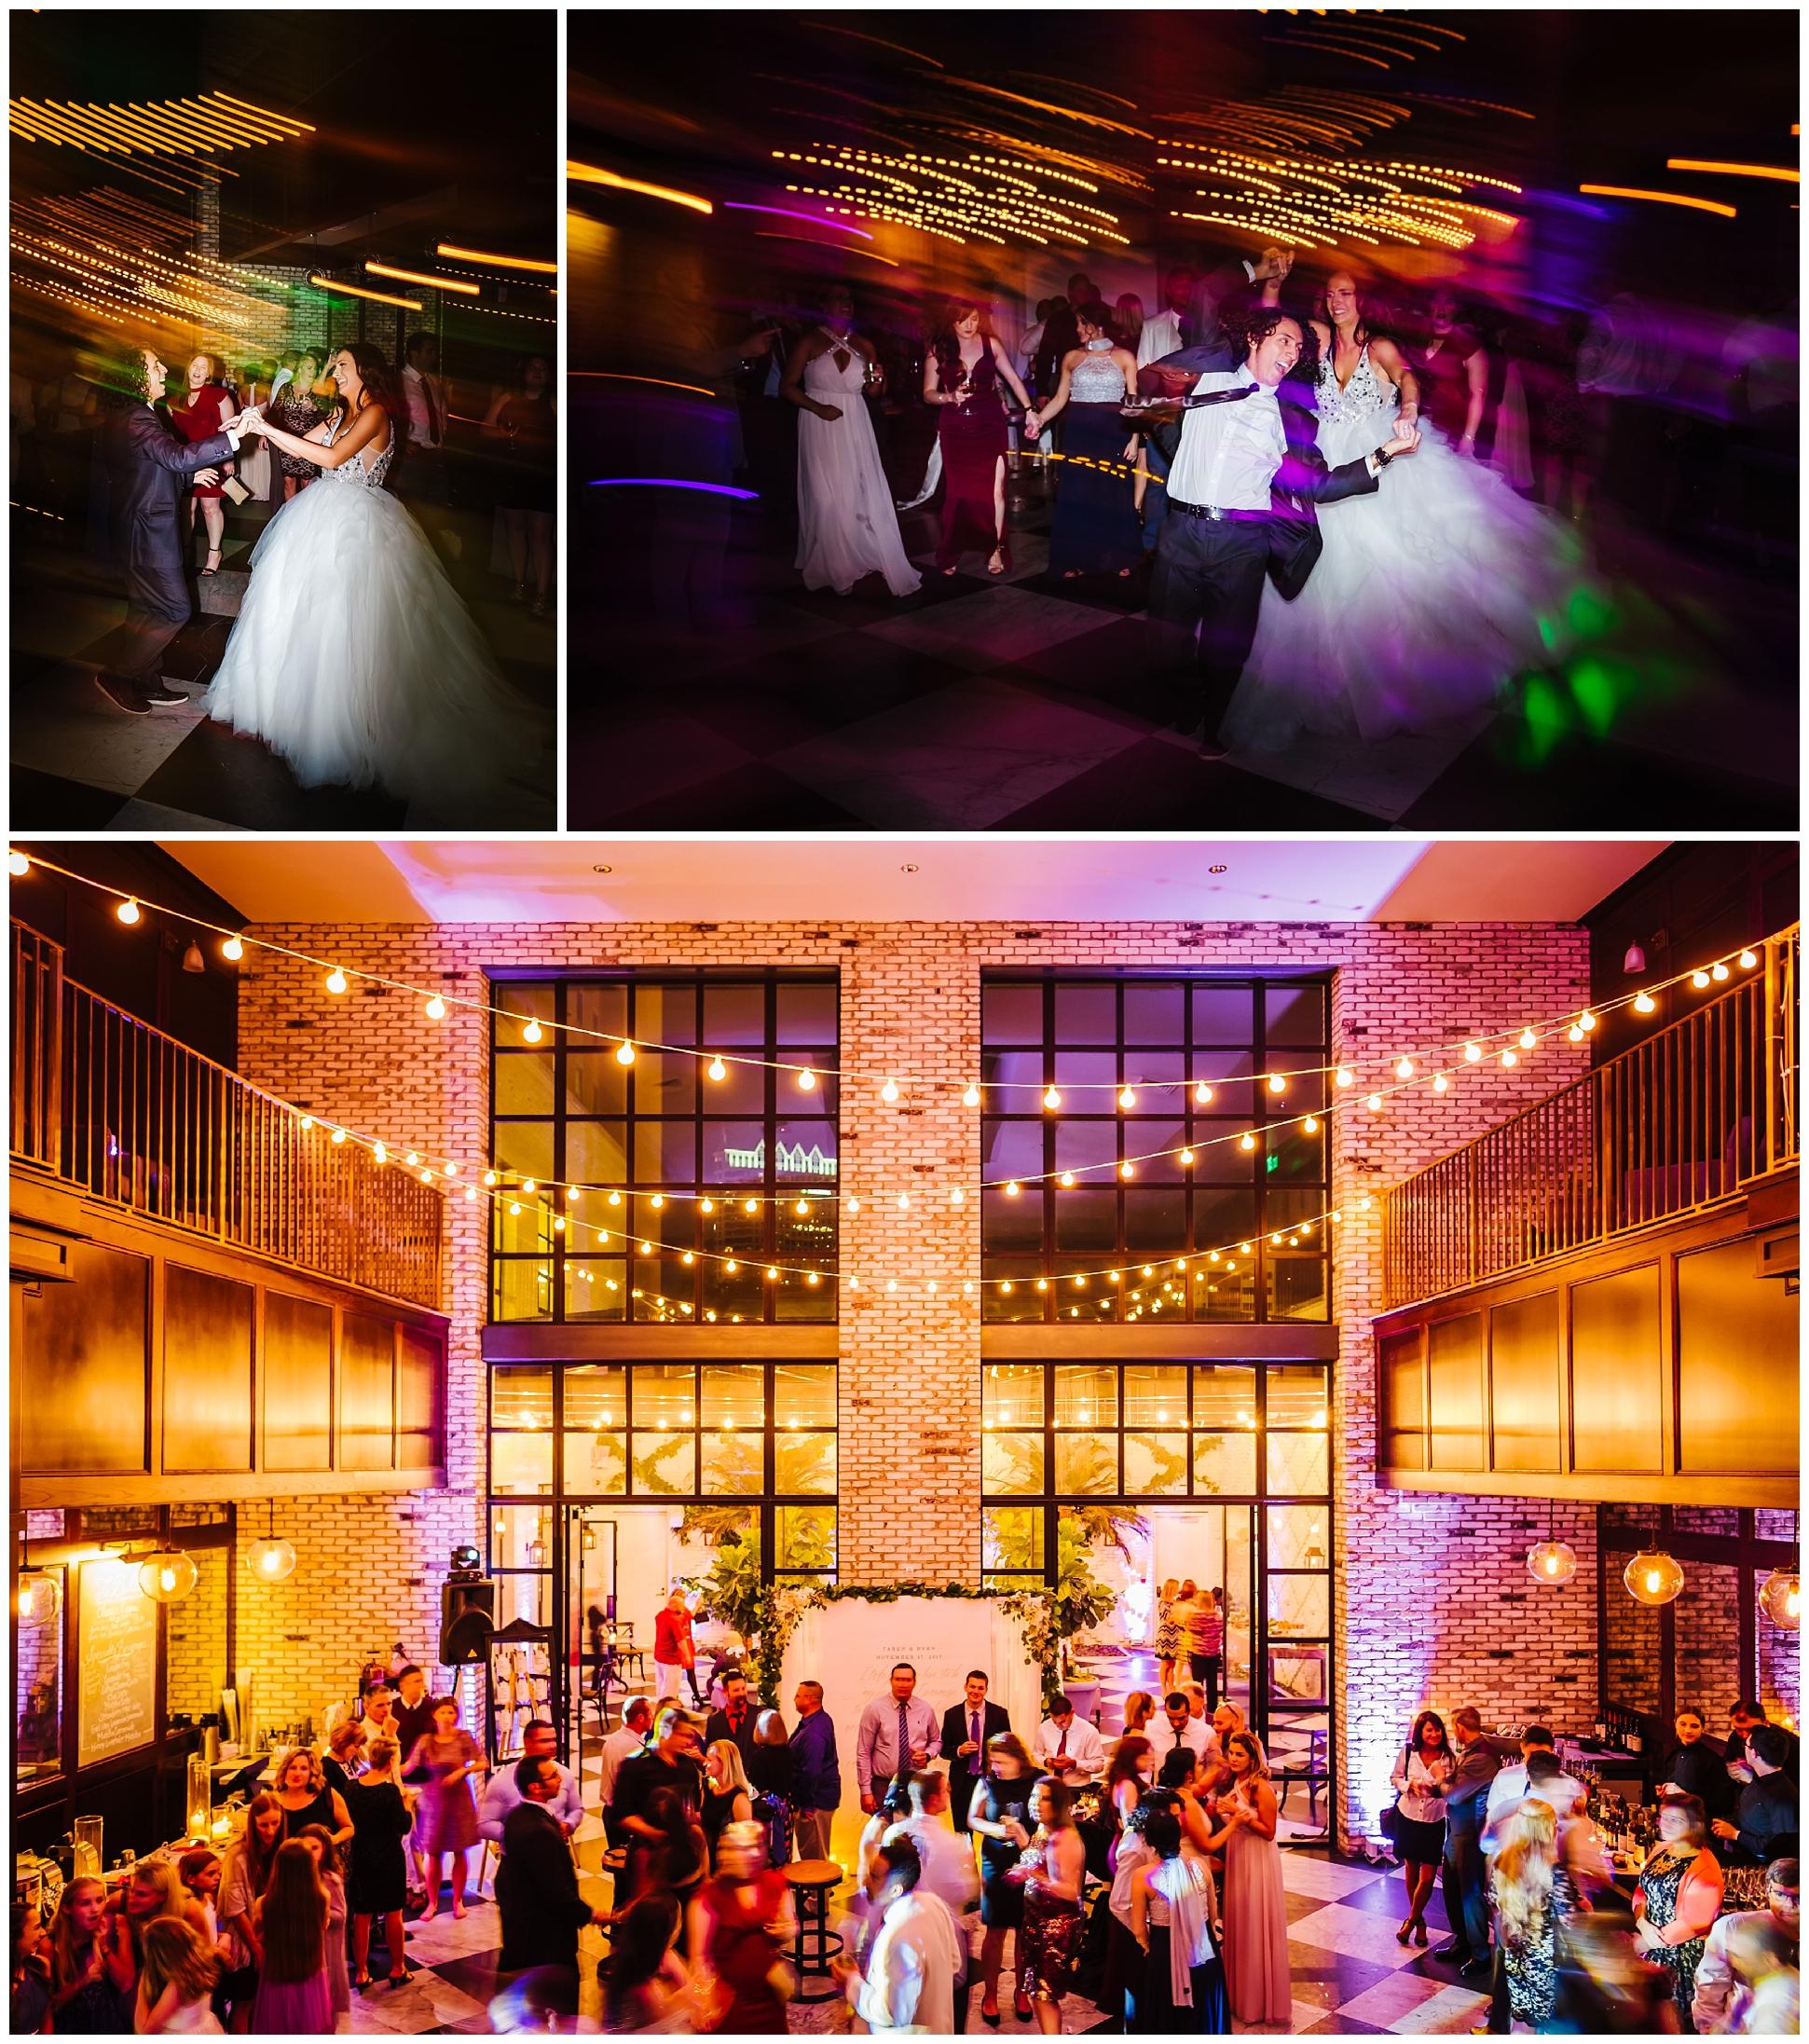 tampa-wedding-photographer-oxford-exchange-garland-candlelight-gold-hayley-paige_0060.jpg